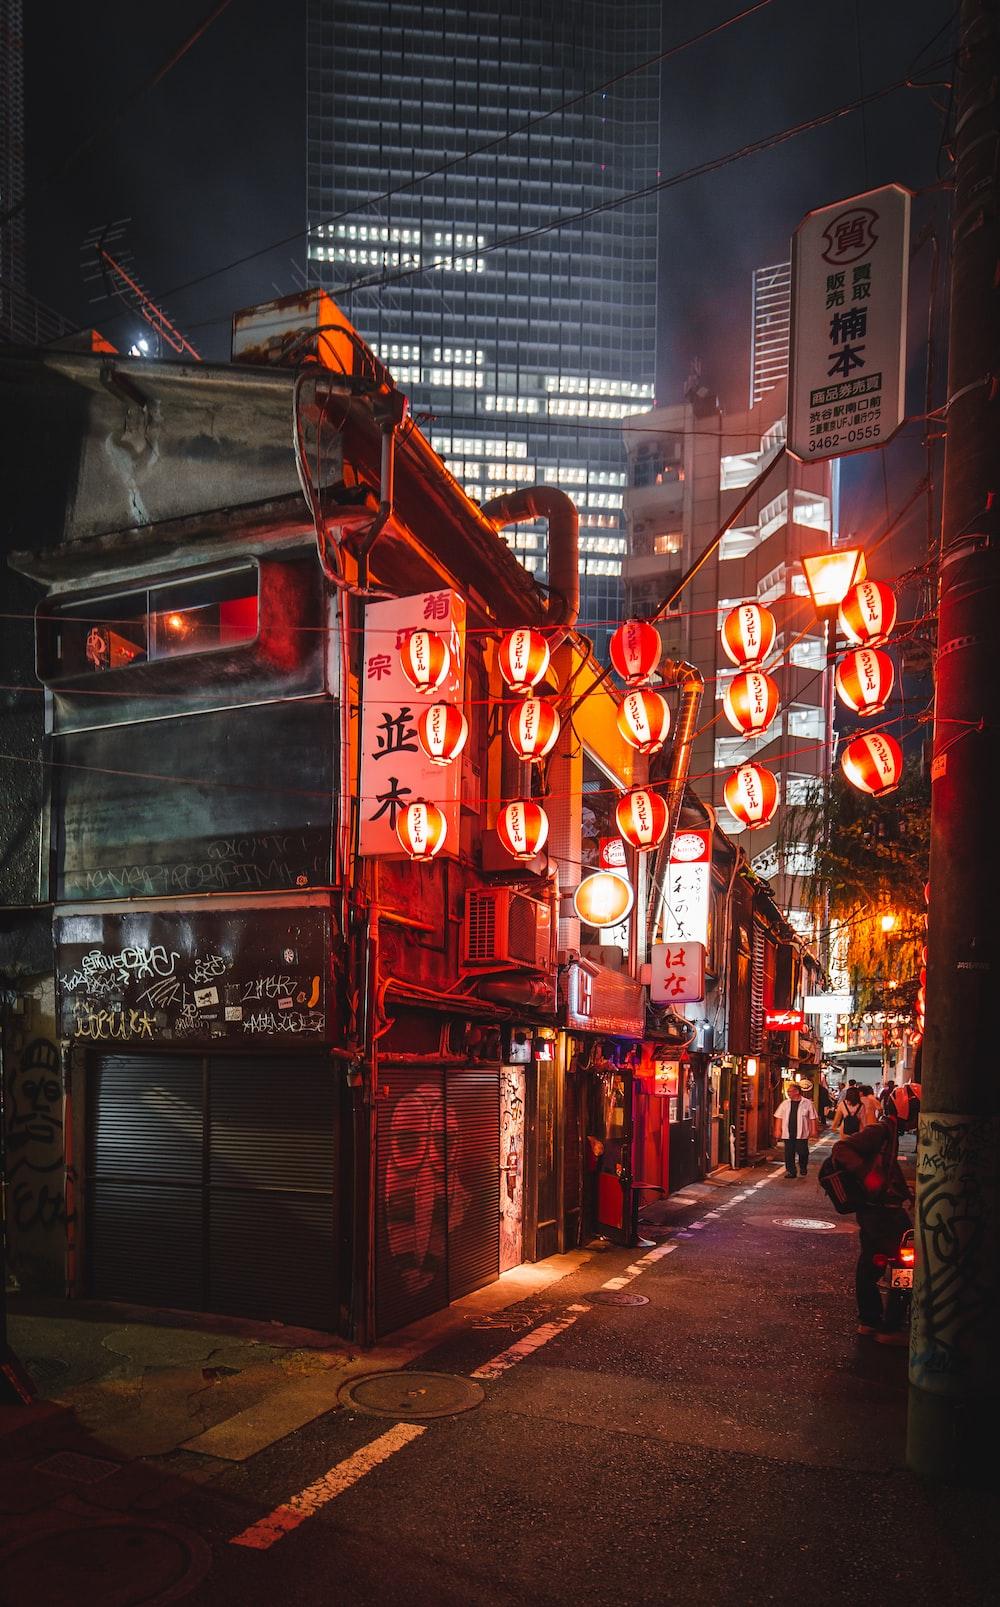 lantern on the street at nighttime